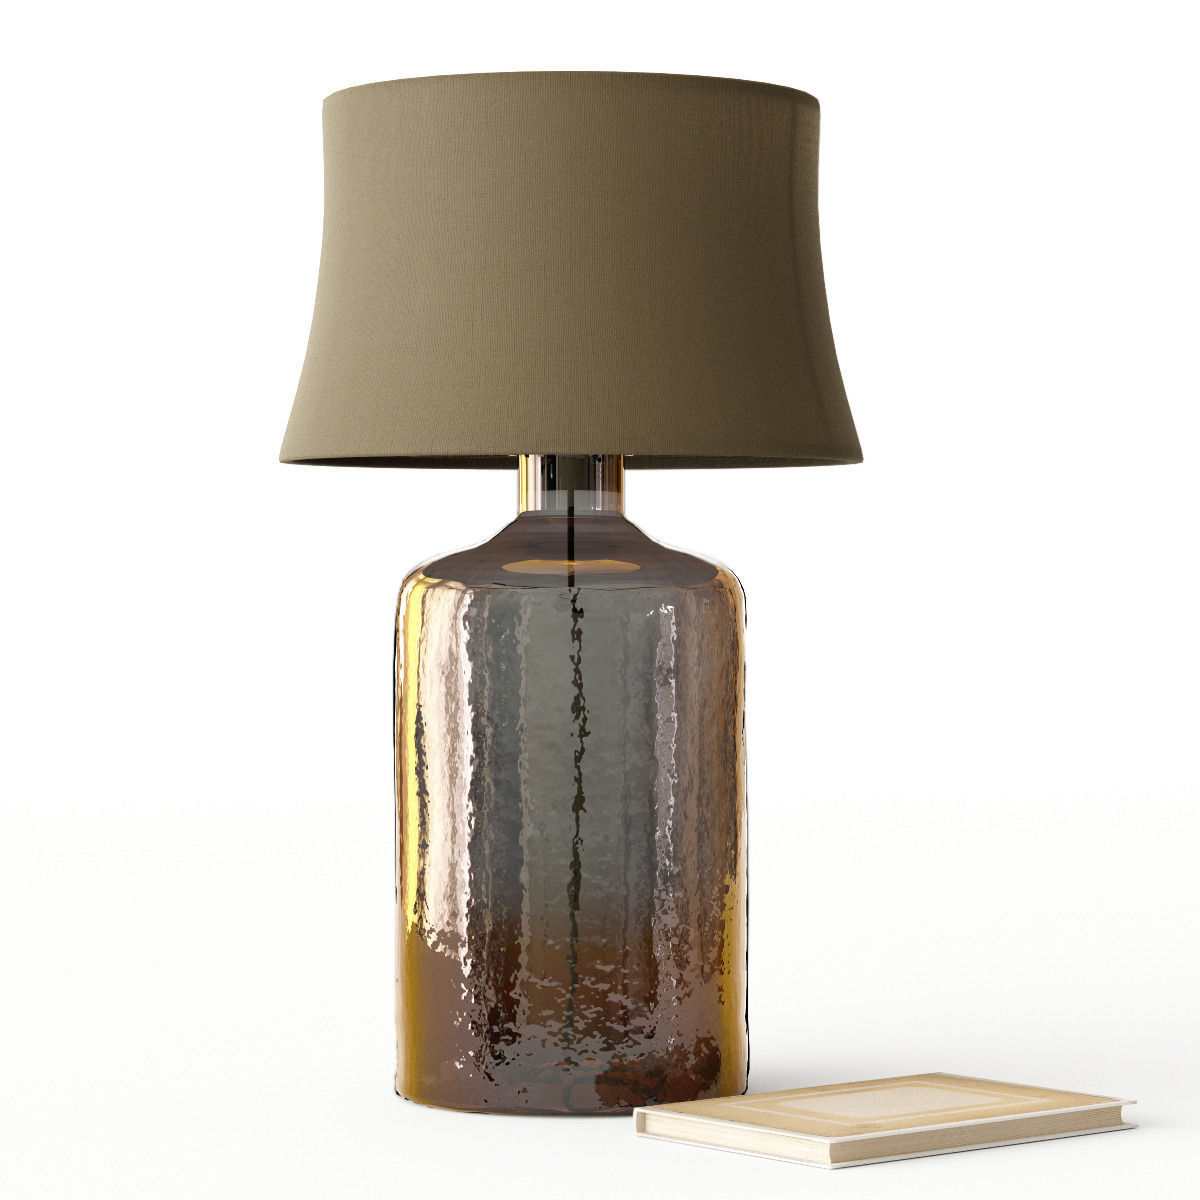 ... Pottery Barn Clift Glass Table Lamp Base   Espresso 3d Model Max Obj  3ds Fbx Mtl ...